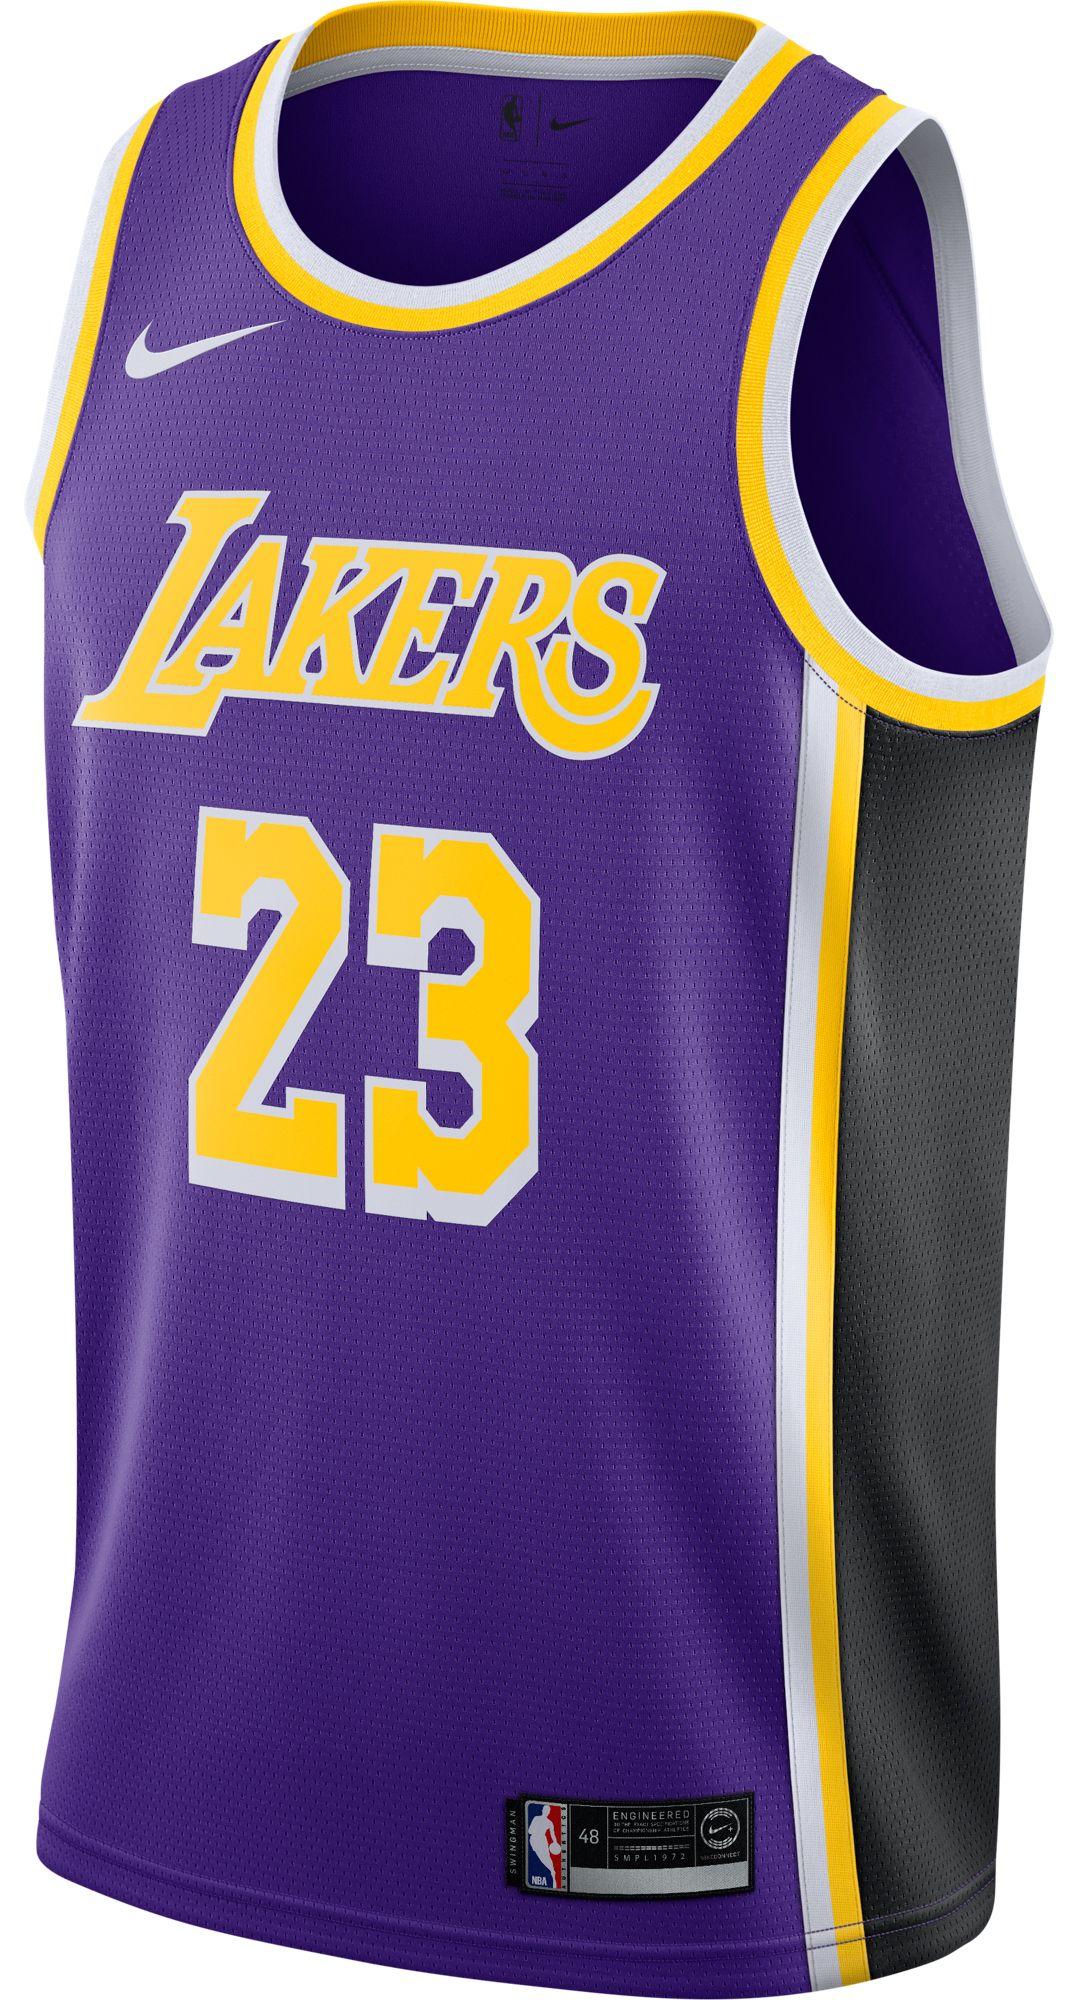 reputable site 1b43d c4972 Nike Men's Los Angeles Lakers LeBron James #23 Purple Dri-FIT Swingman  Jersey